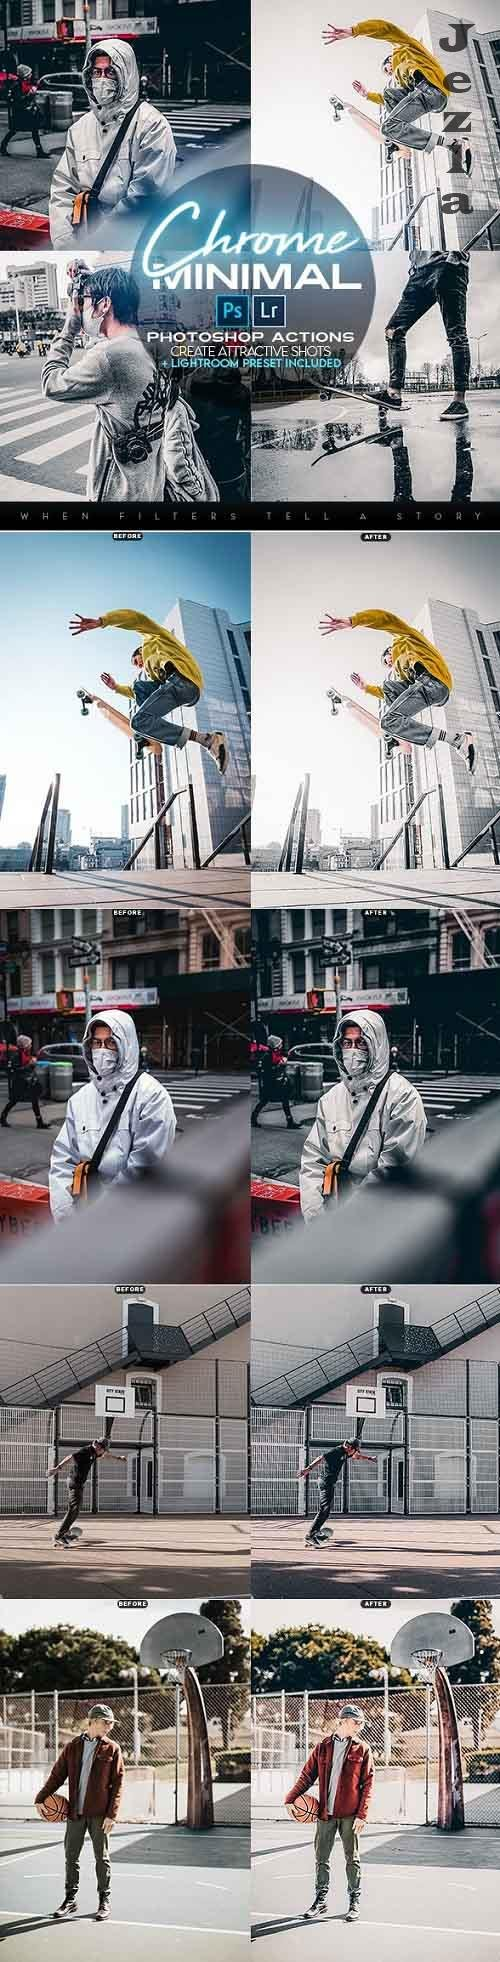 Chrome Minimal Photoshop Actions + LR Presets 28257313